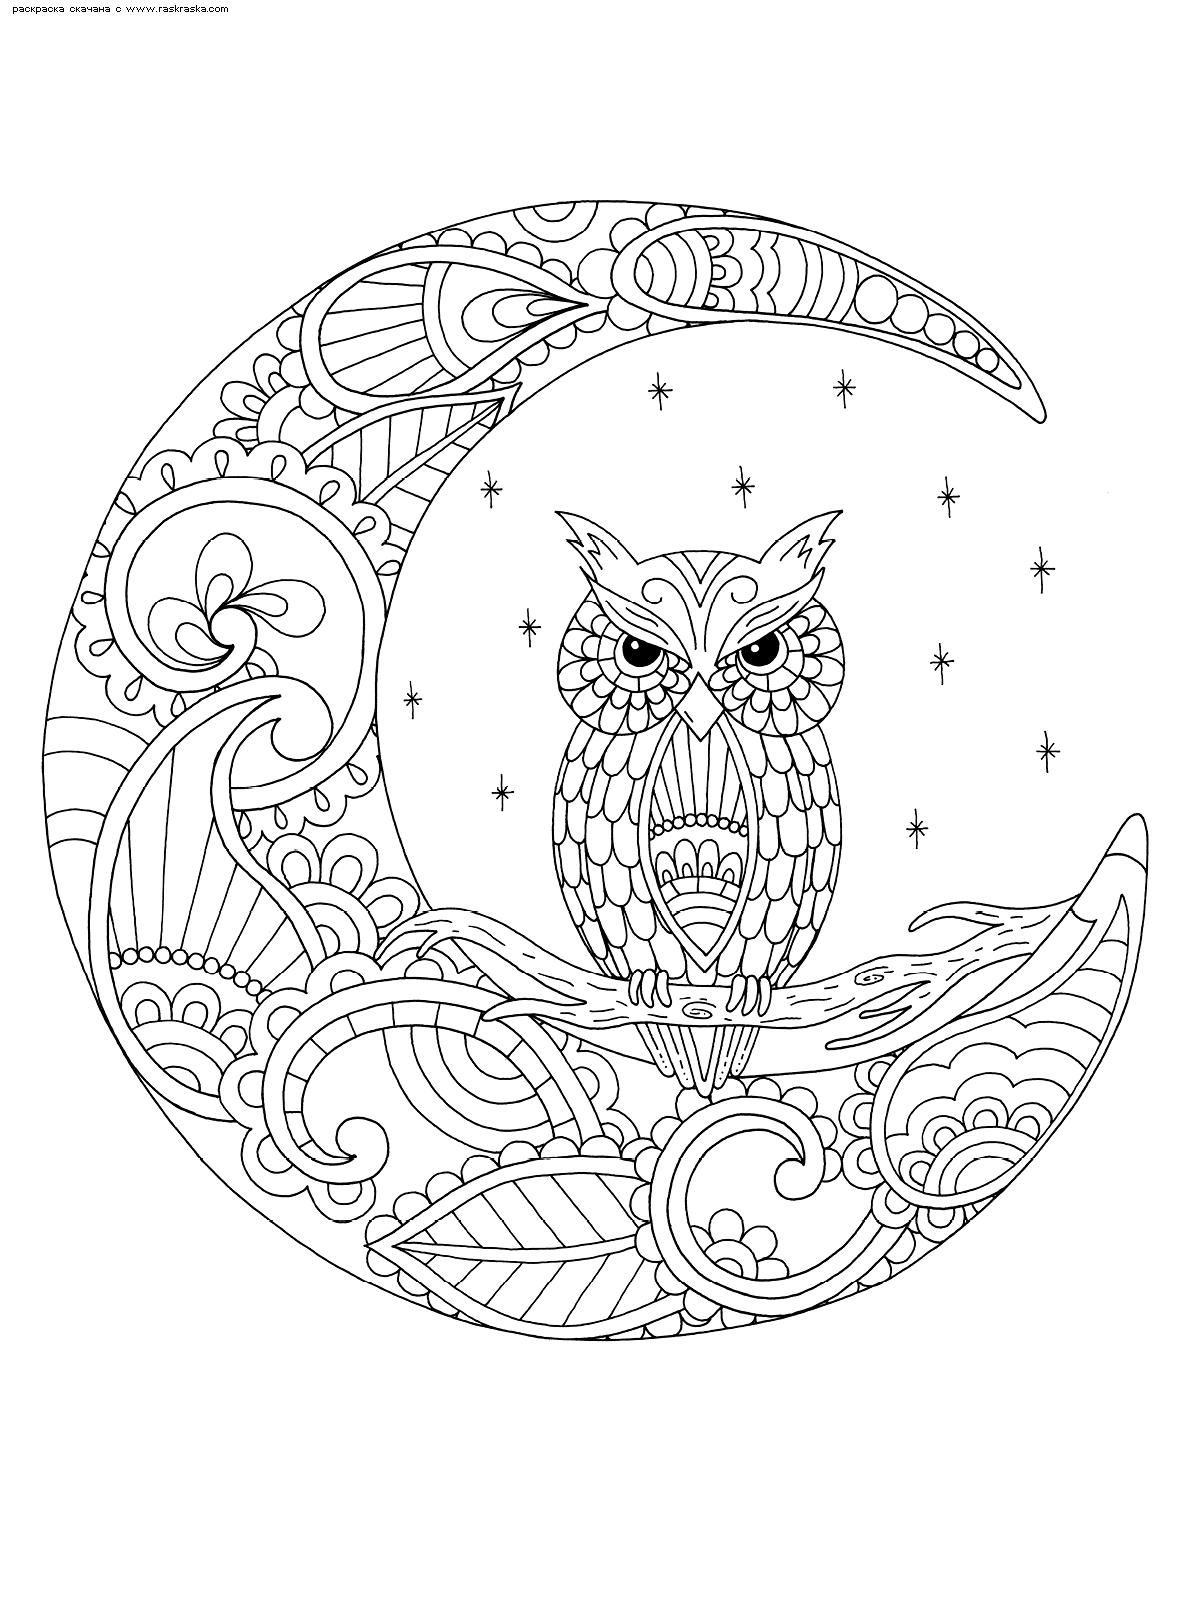 Раскраска Сова и месяц. Раскраска сова, месяц, антистресс